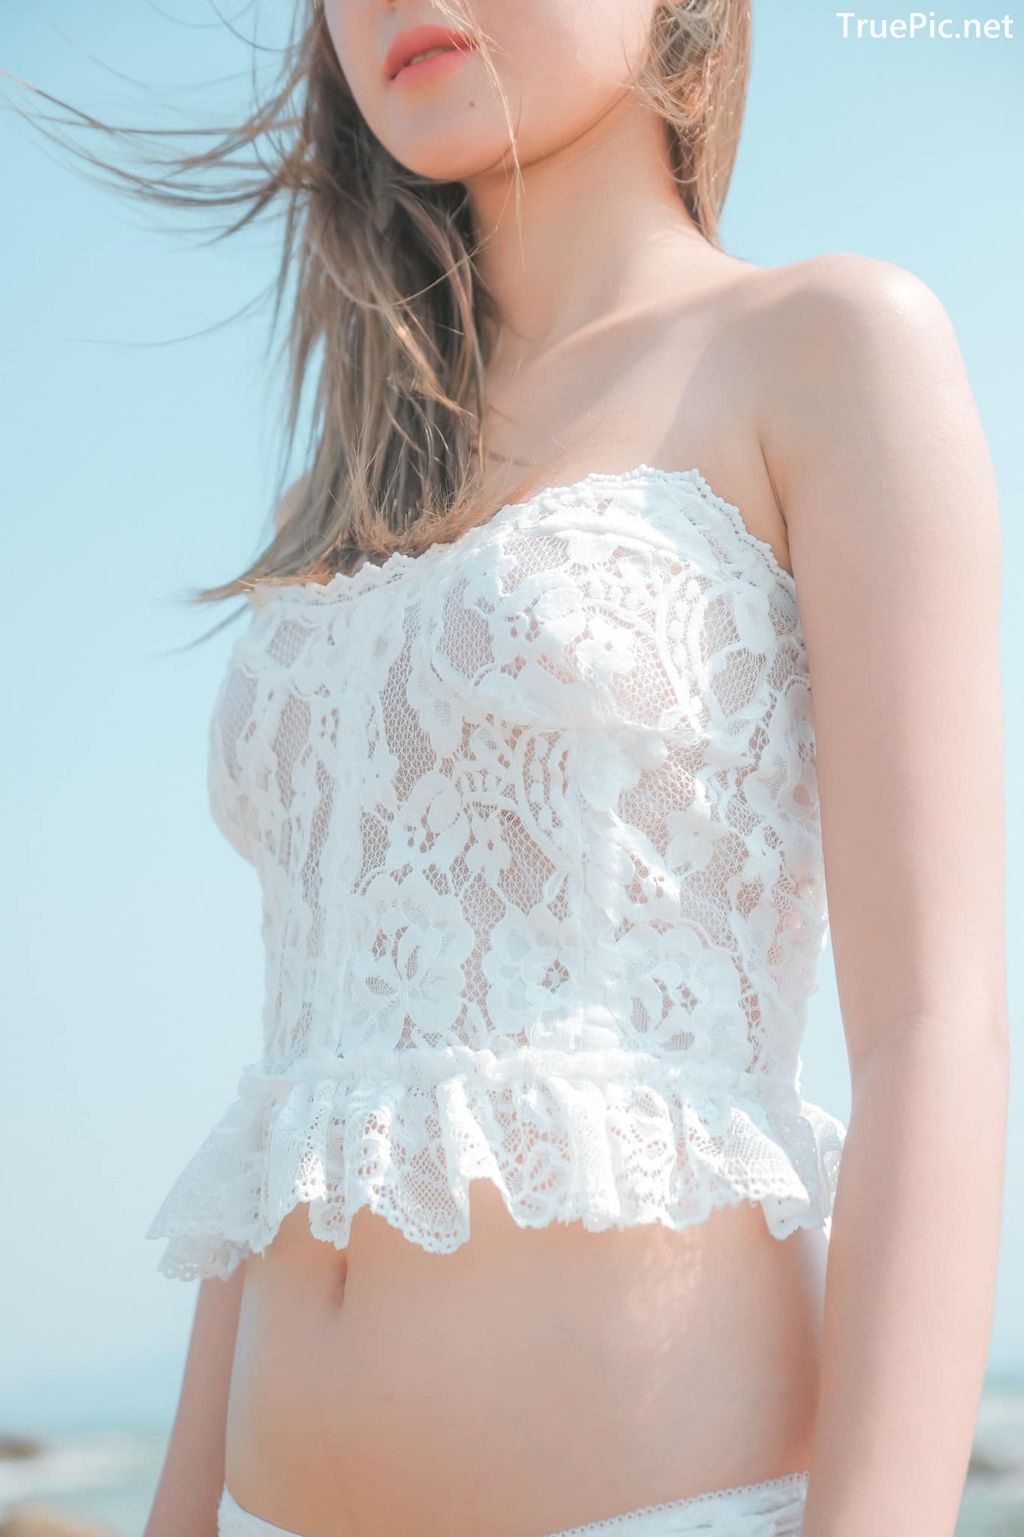 Image-Thailand-Model-Pitcha-Srisattabuth-White-Lace-Bikini-TruePic.net- Picture-10